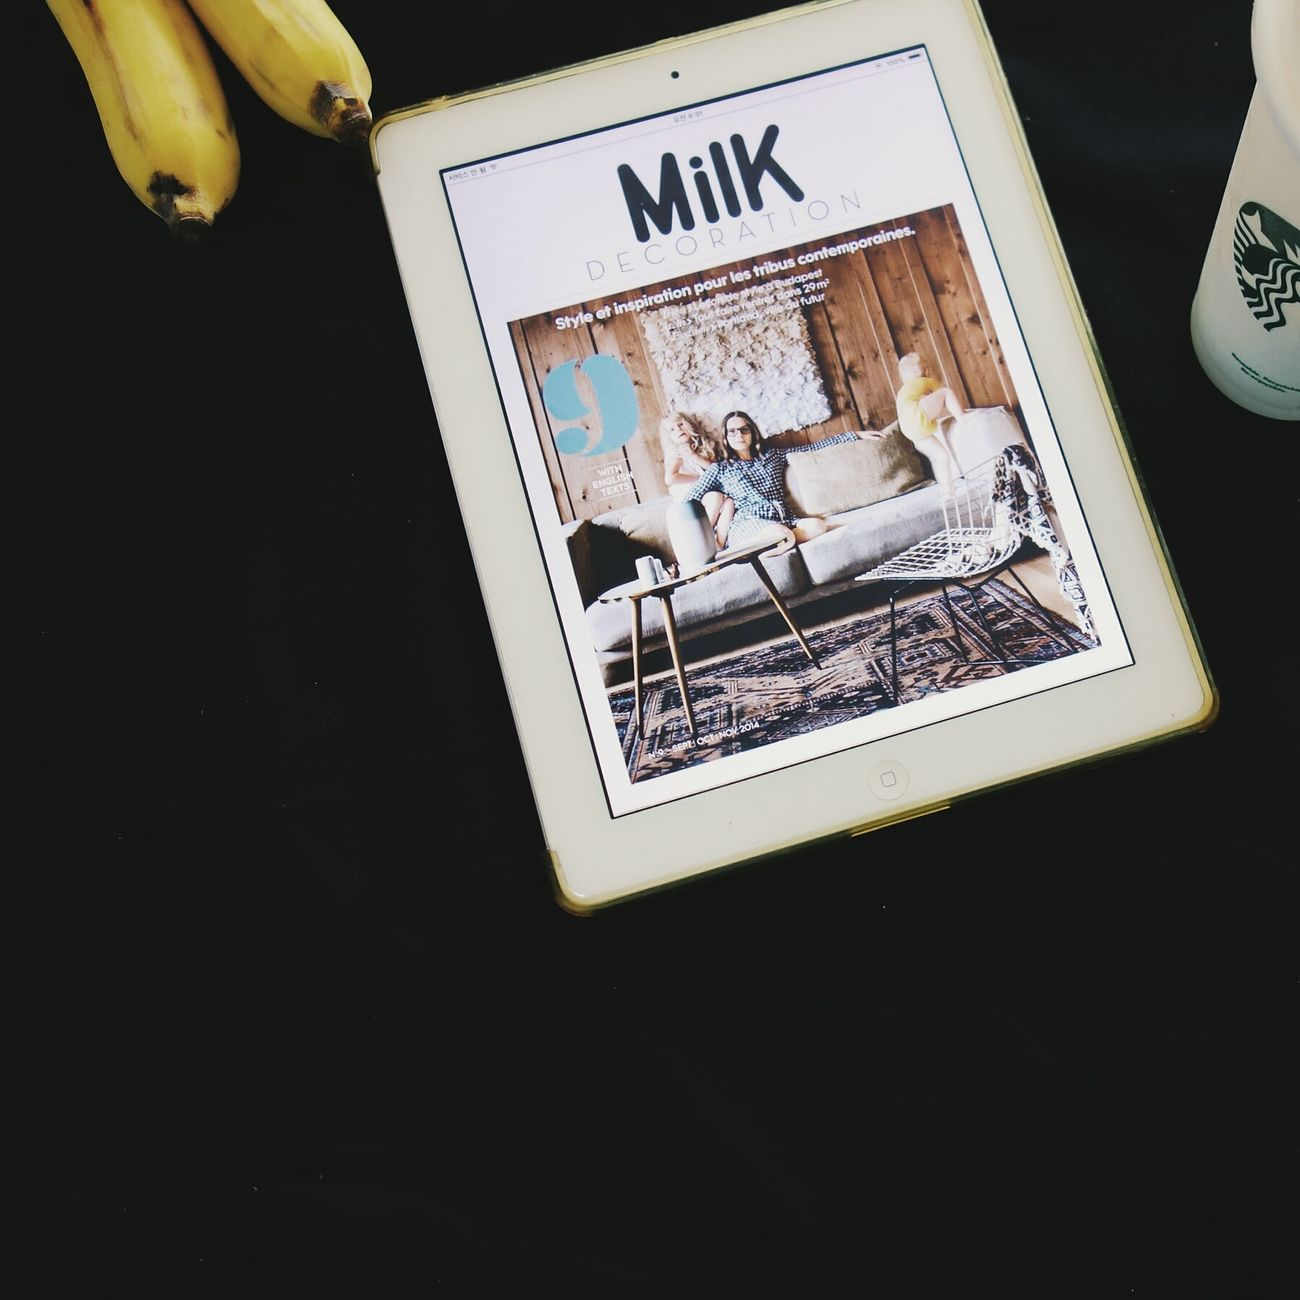 Three things this morning. Milkdecoration Ipad Coffee Digitalmagazine